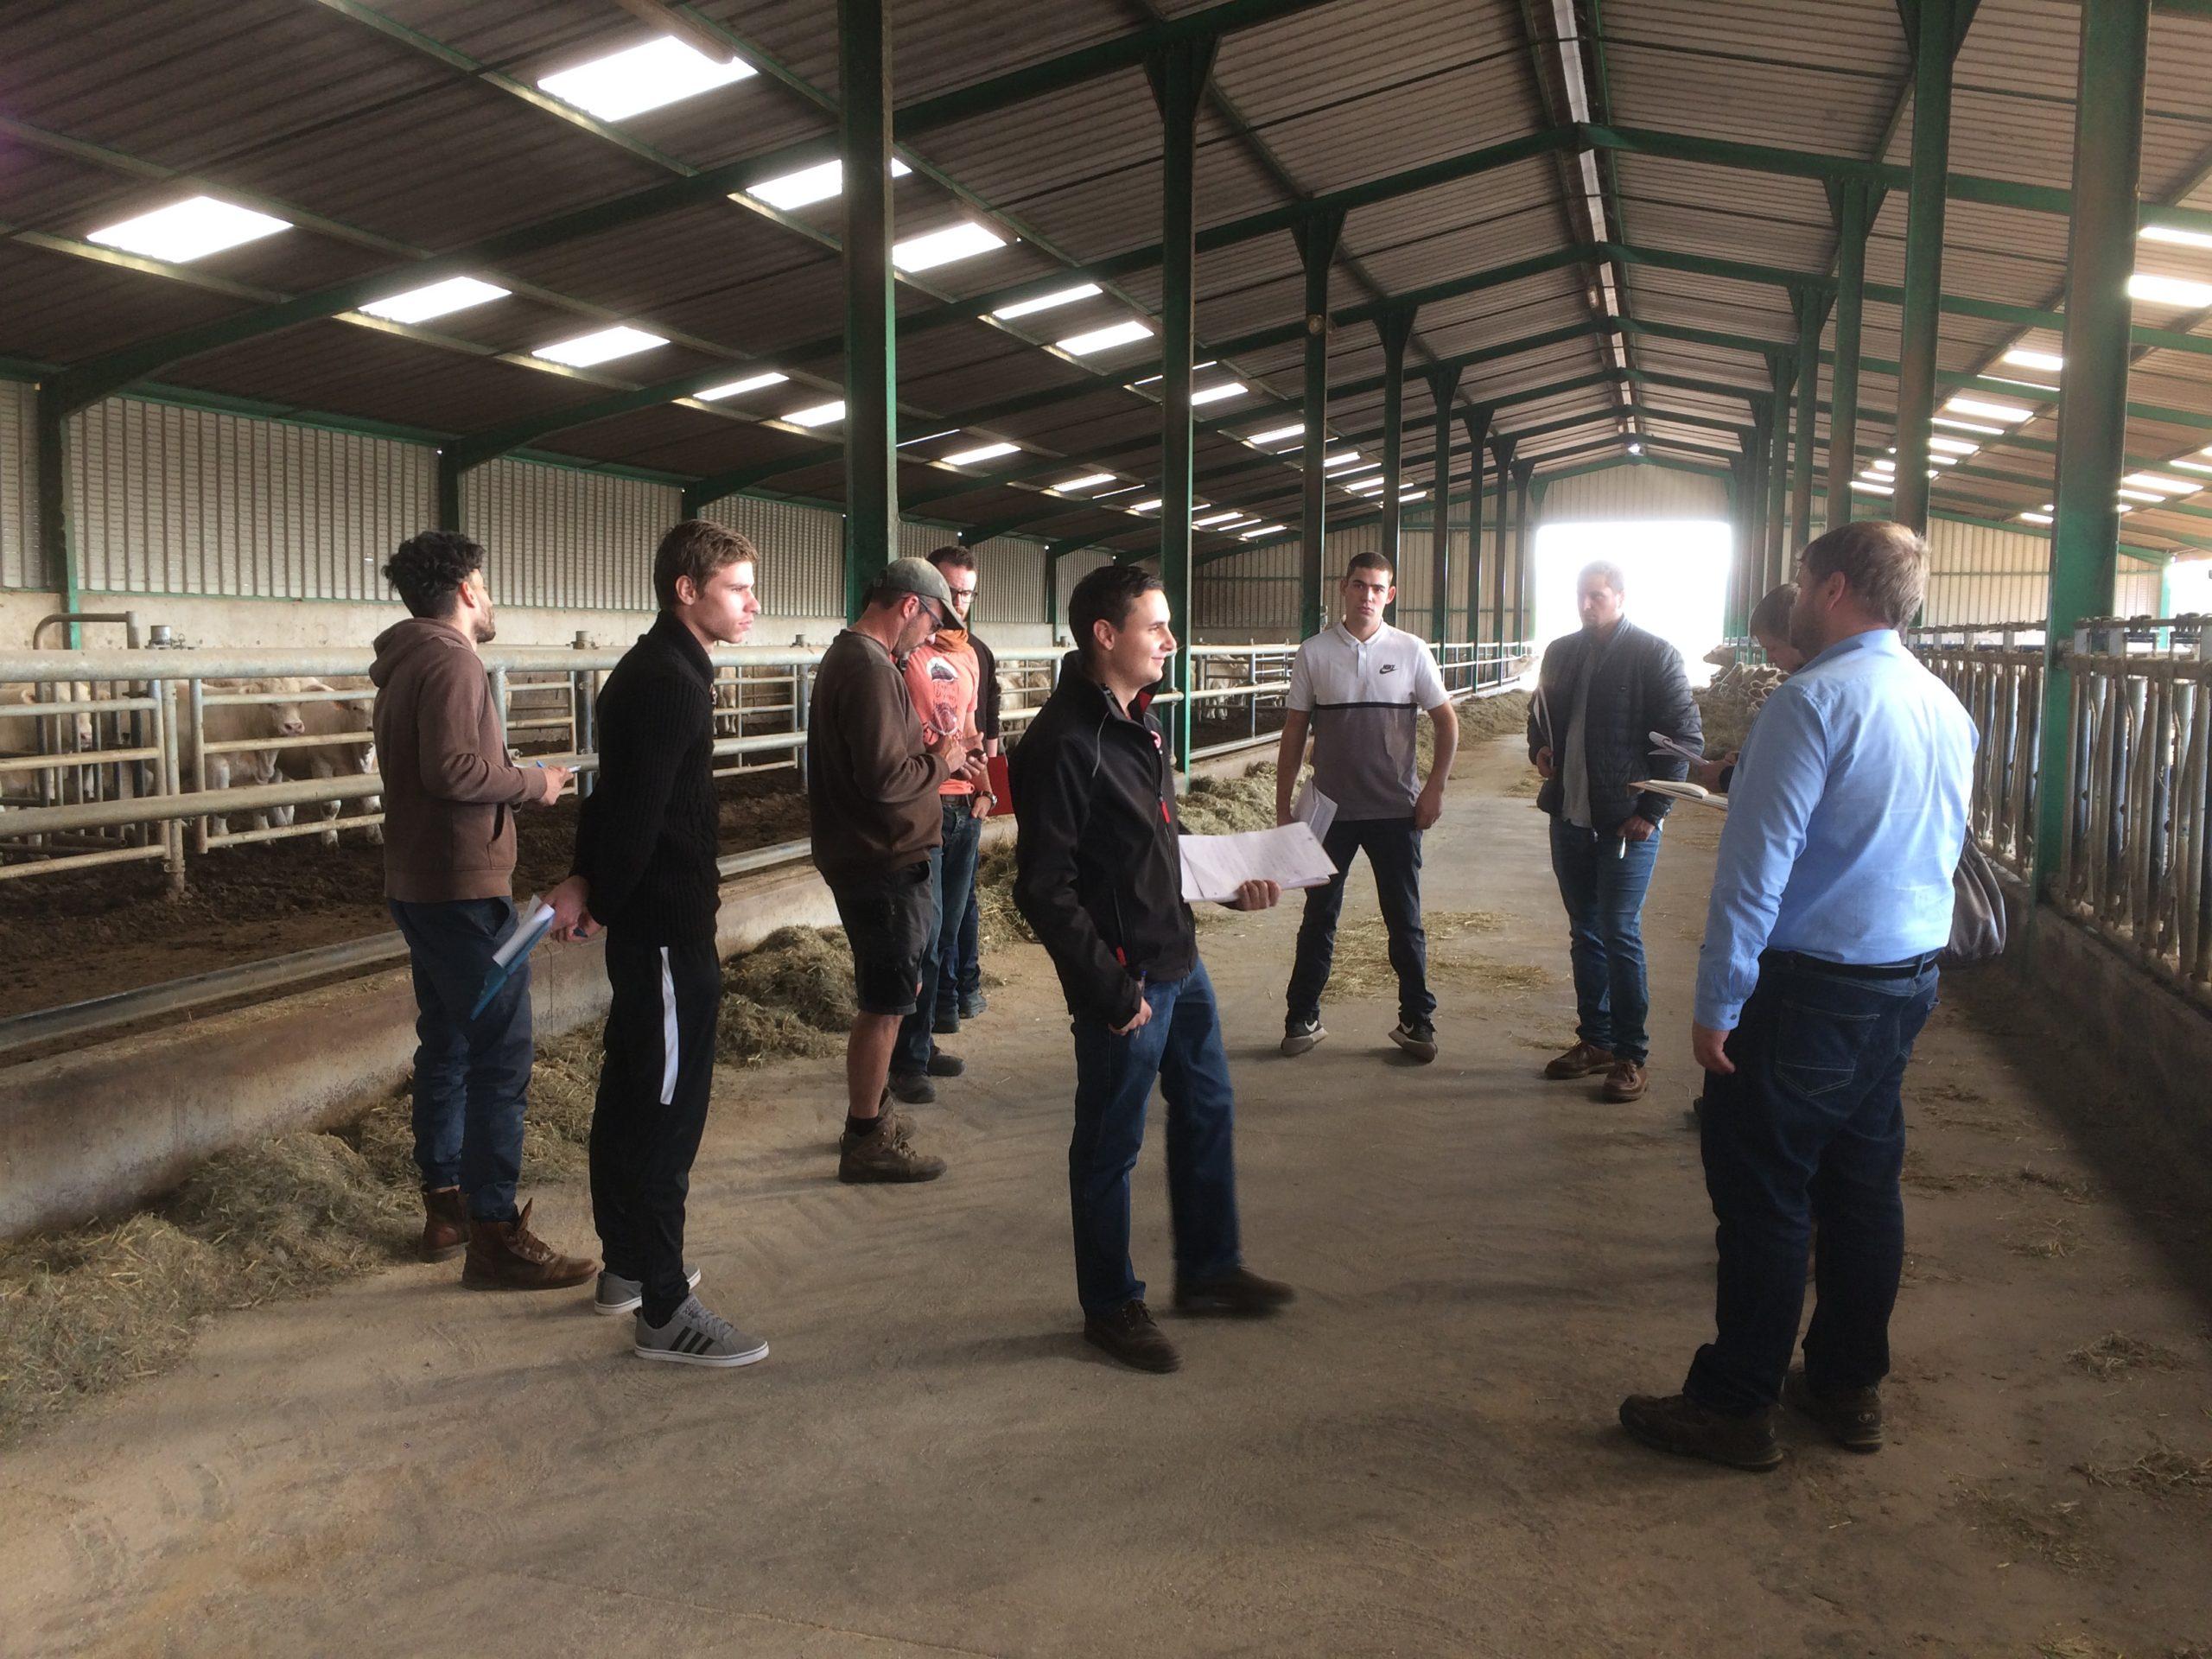 formation-technicien-agricole-roanne-ferme-exploitation-apprentissage-formation-continue